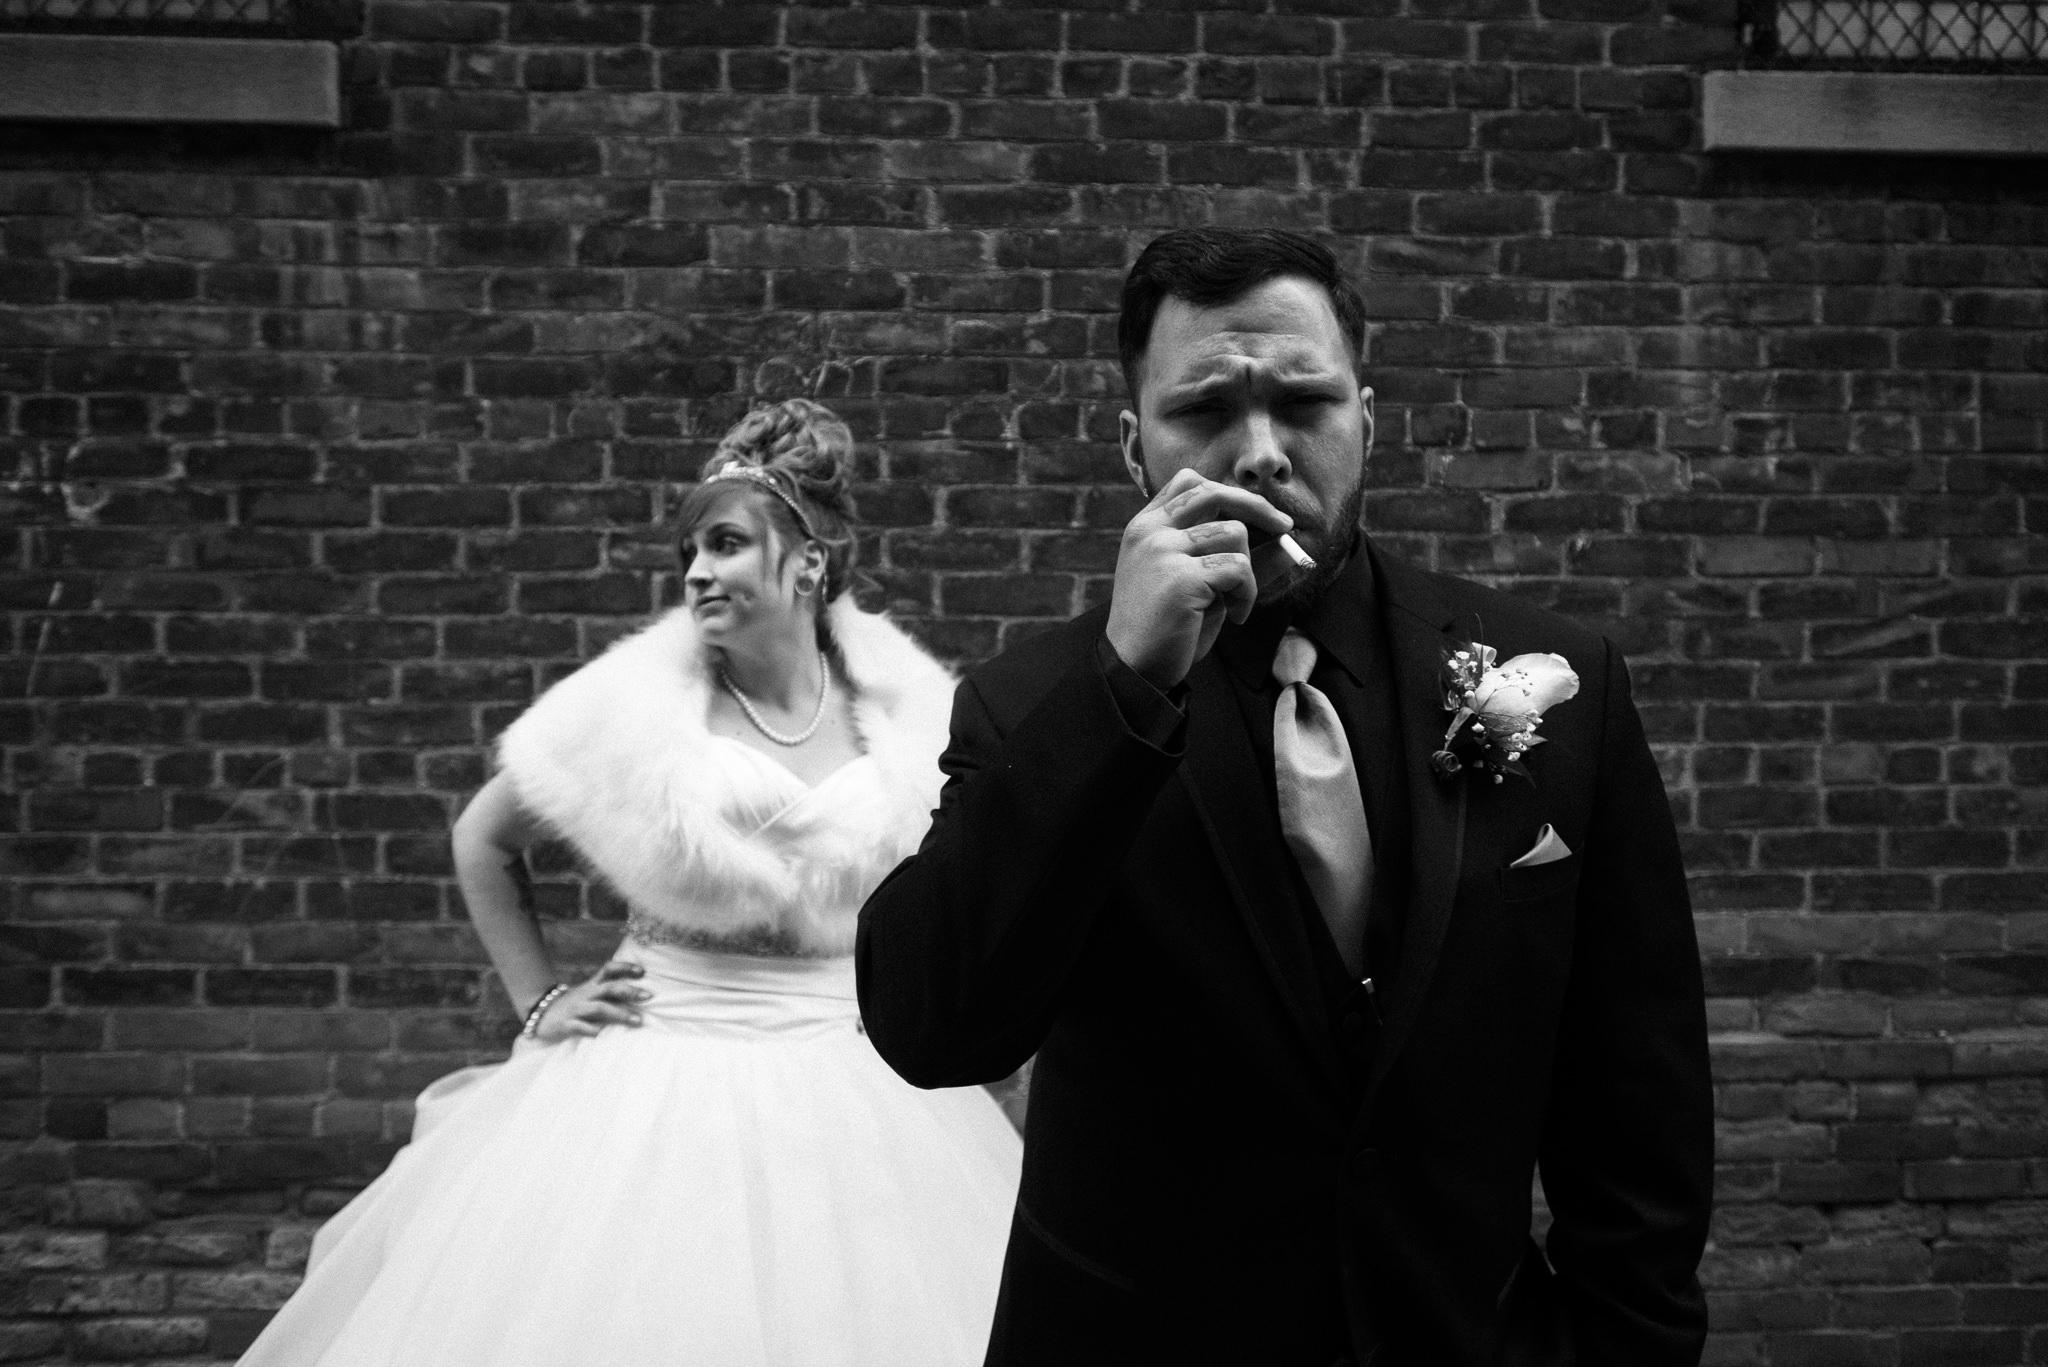 Grant Beachy Photo portrait wedding goshen elkhart south bend chicago-039.jpg